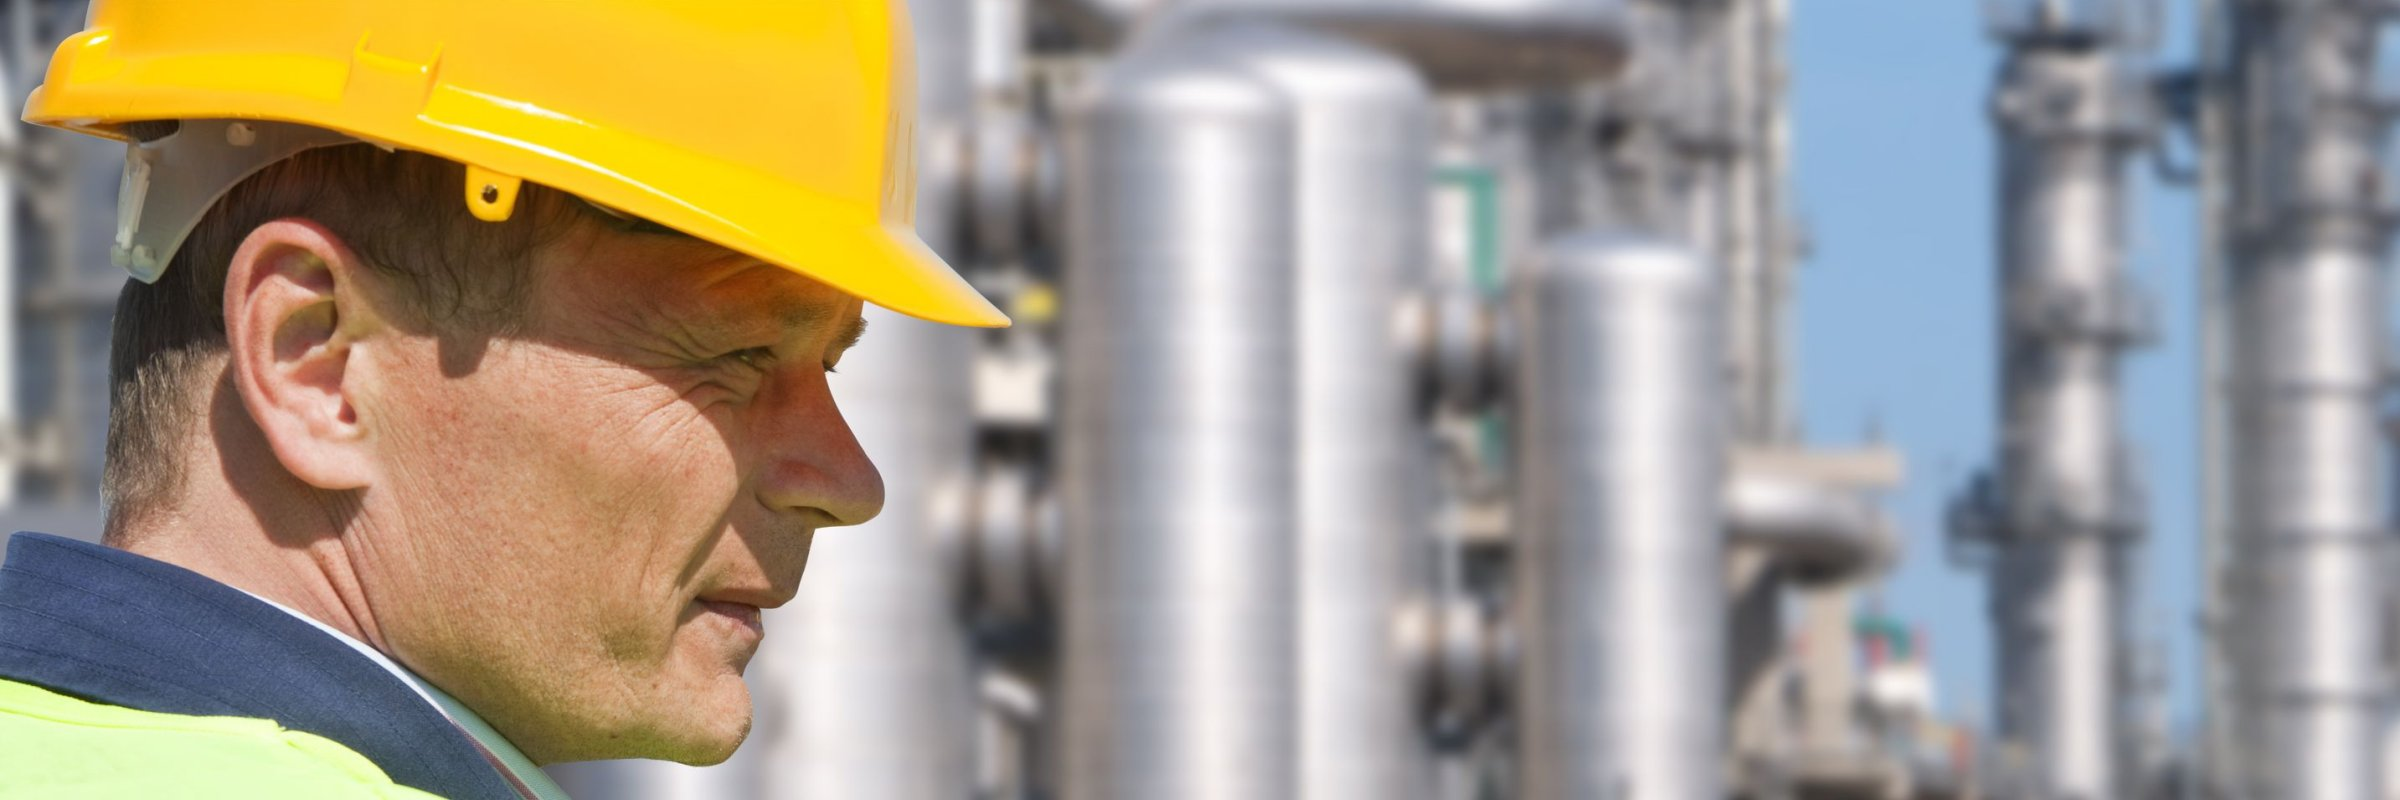 training diploma petrochemische plant